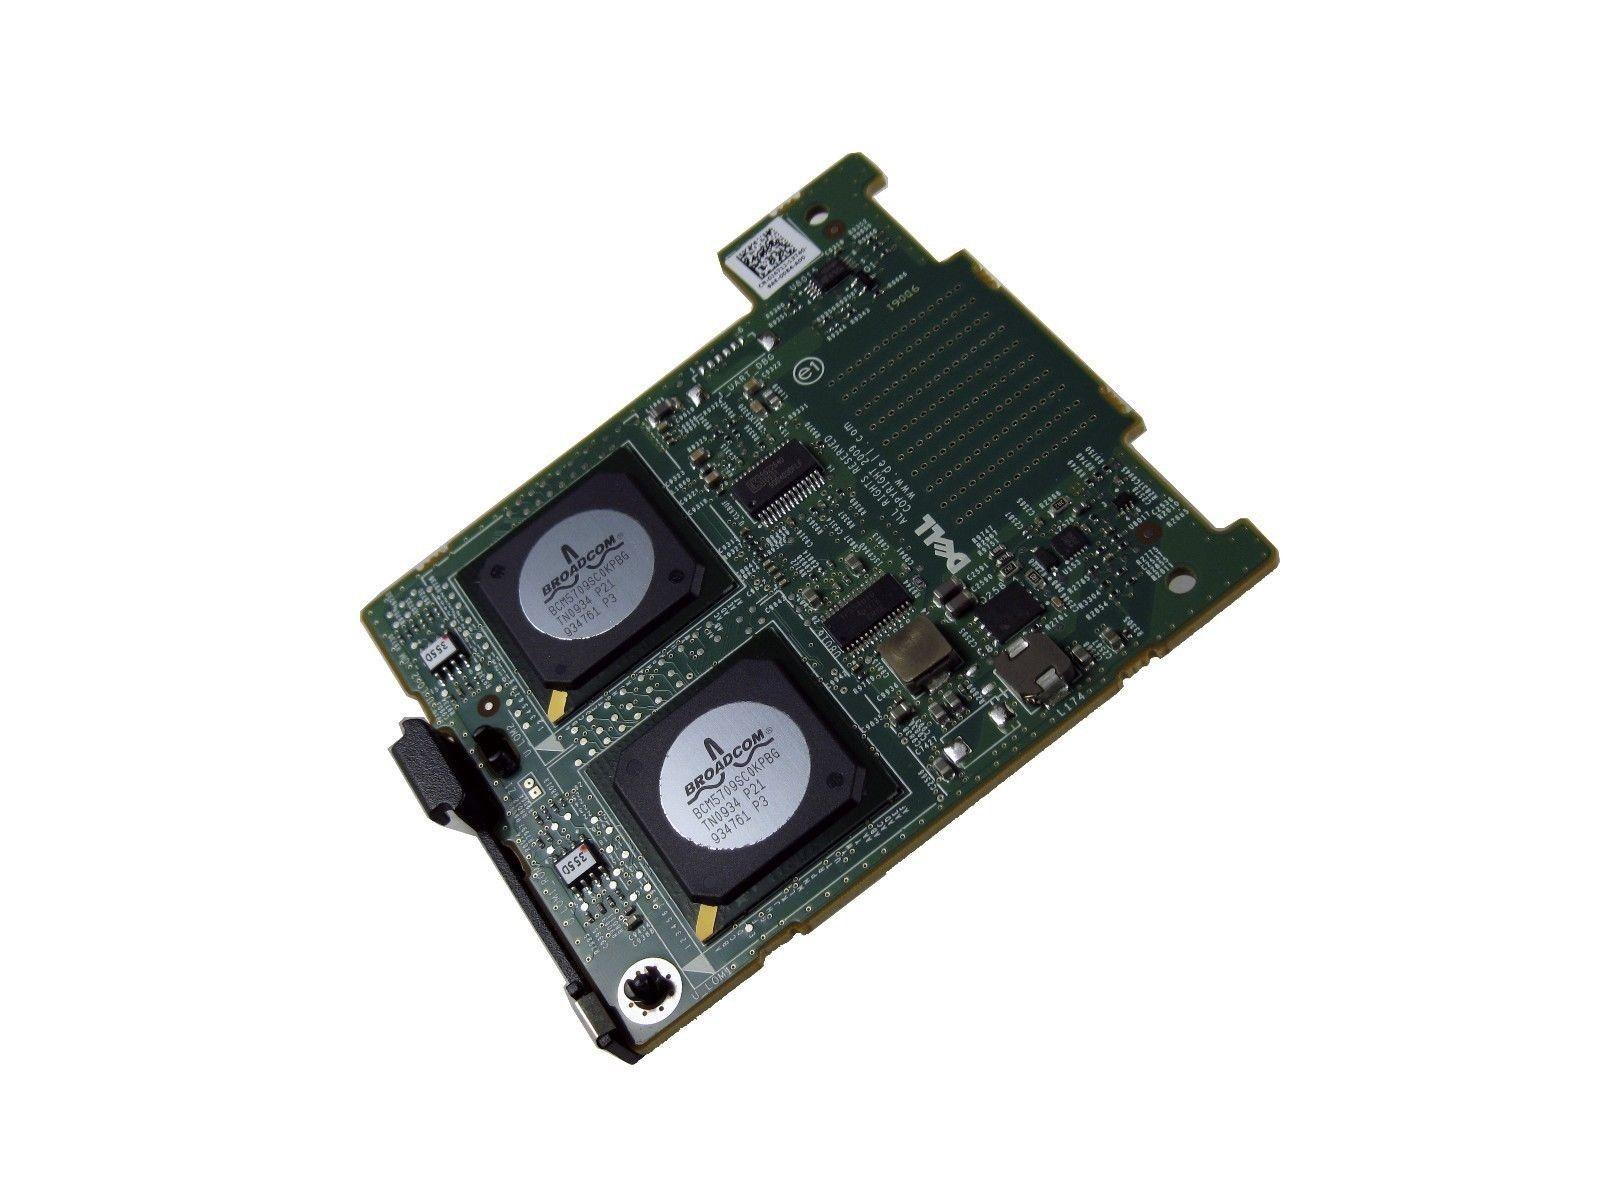 Dell J471J Broadcom 5709 Quad Port 10/100/1000 Base T 1Gbps Network Card